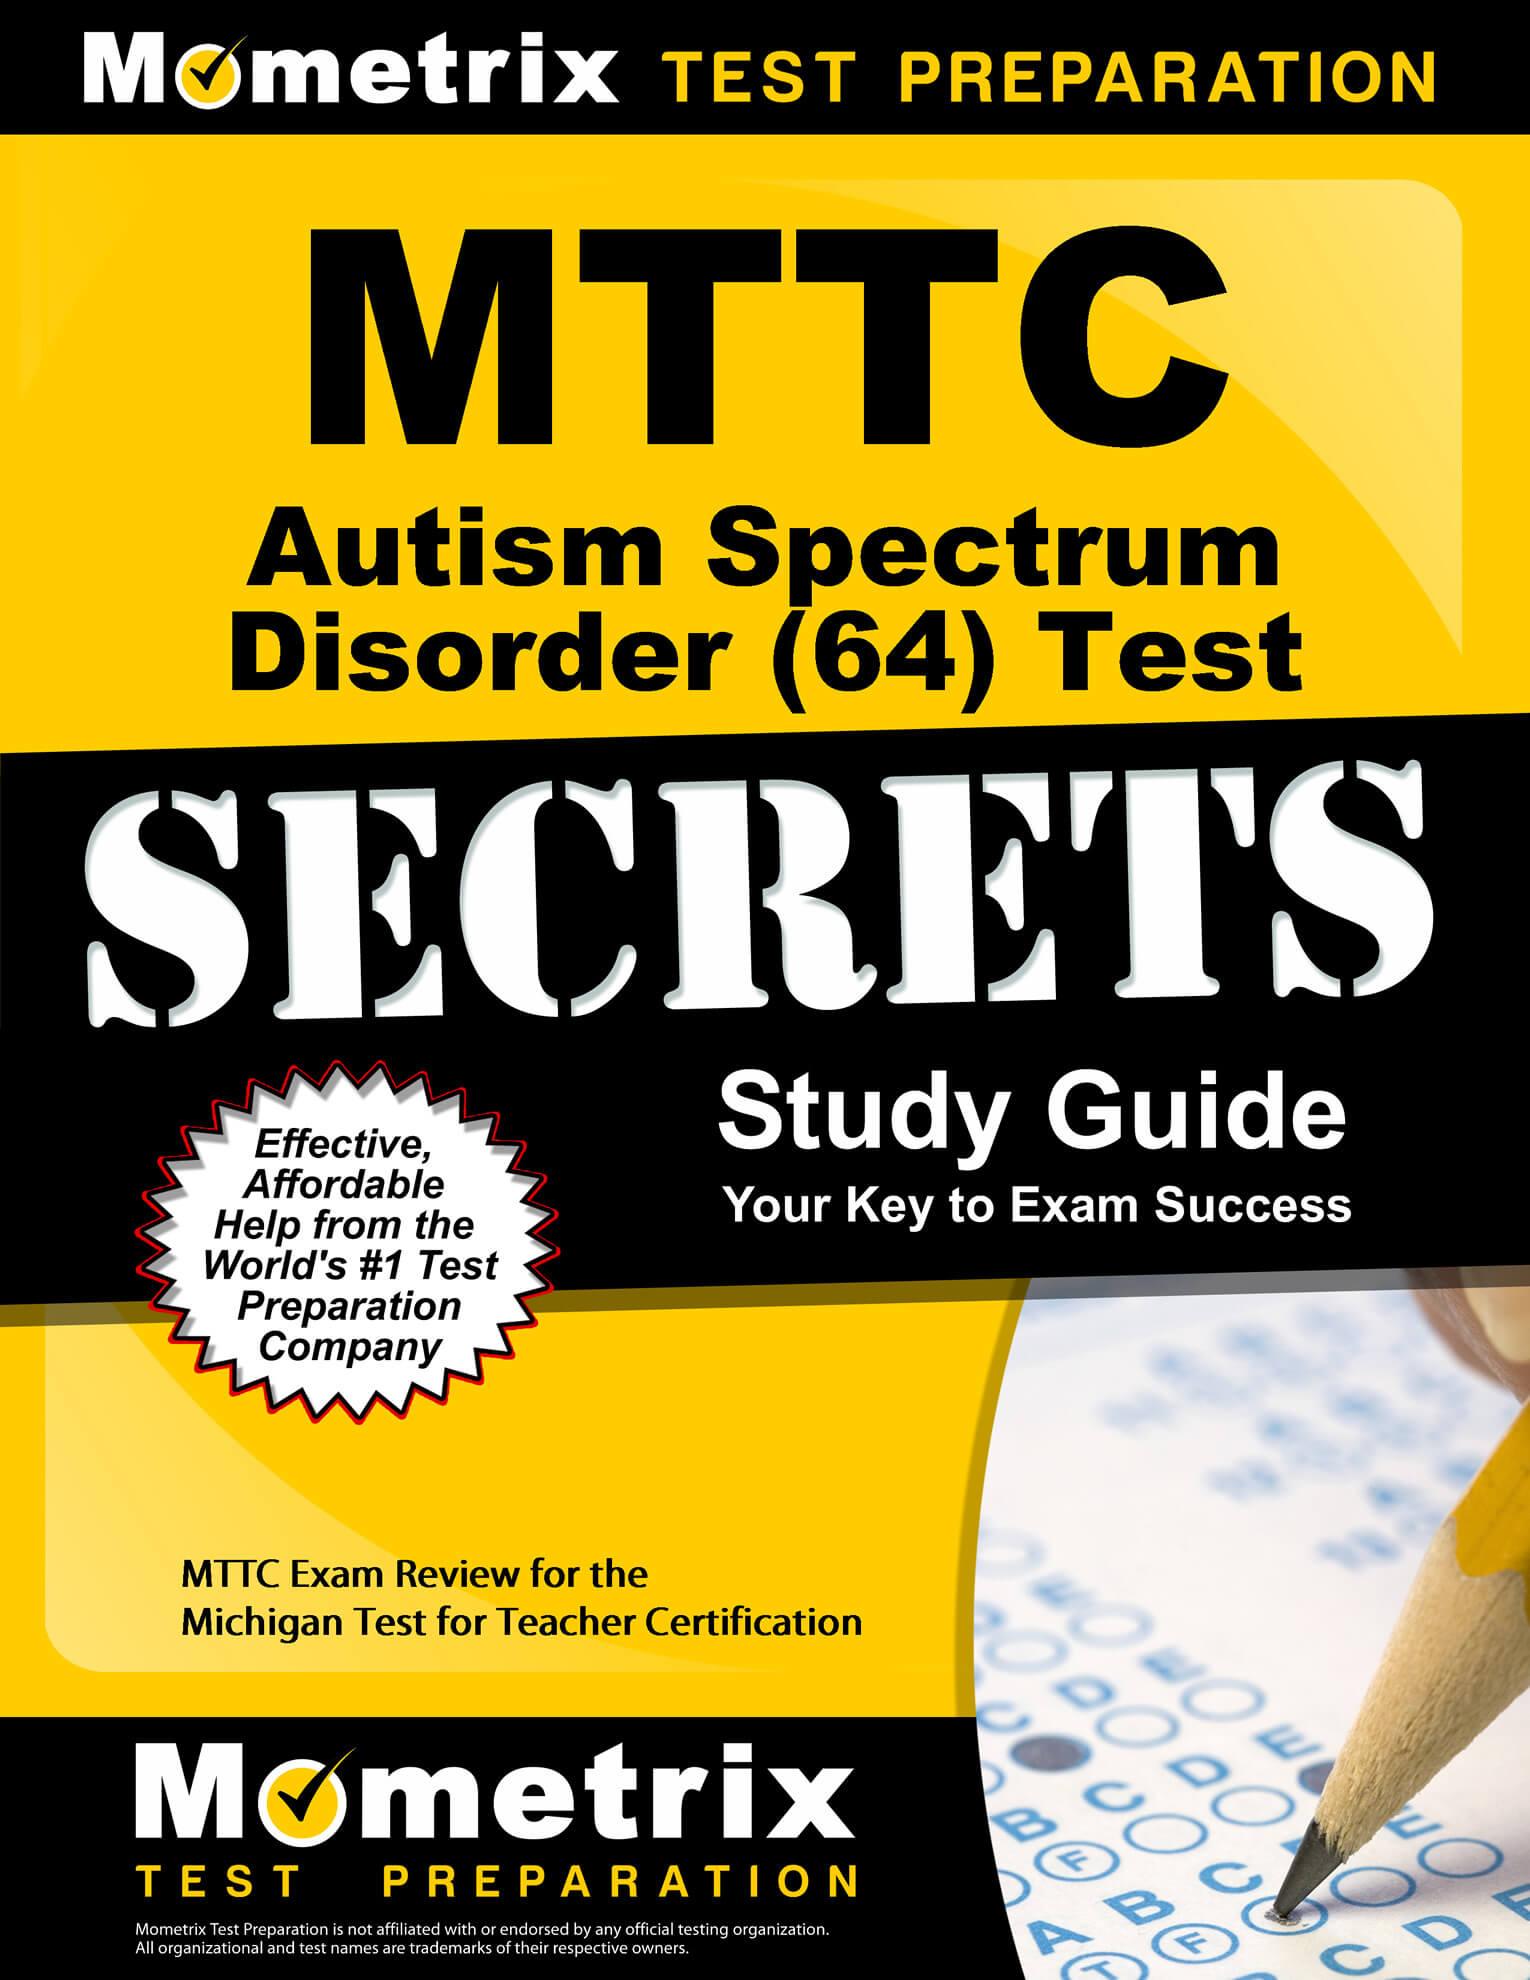 Best Free MTTC Autism Spectrum Disorder Practice Test